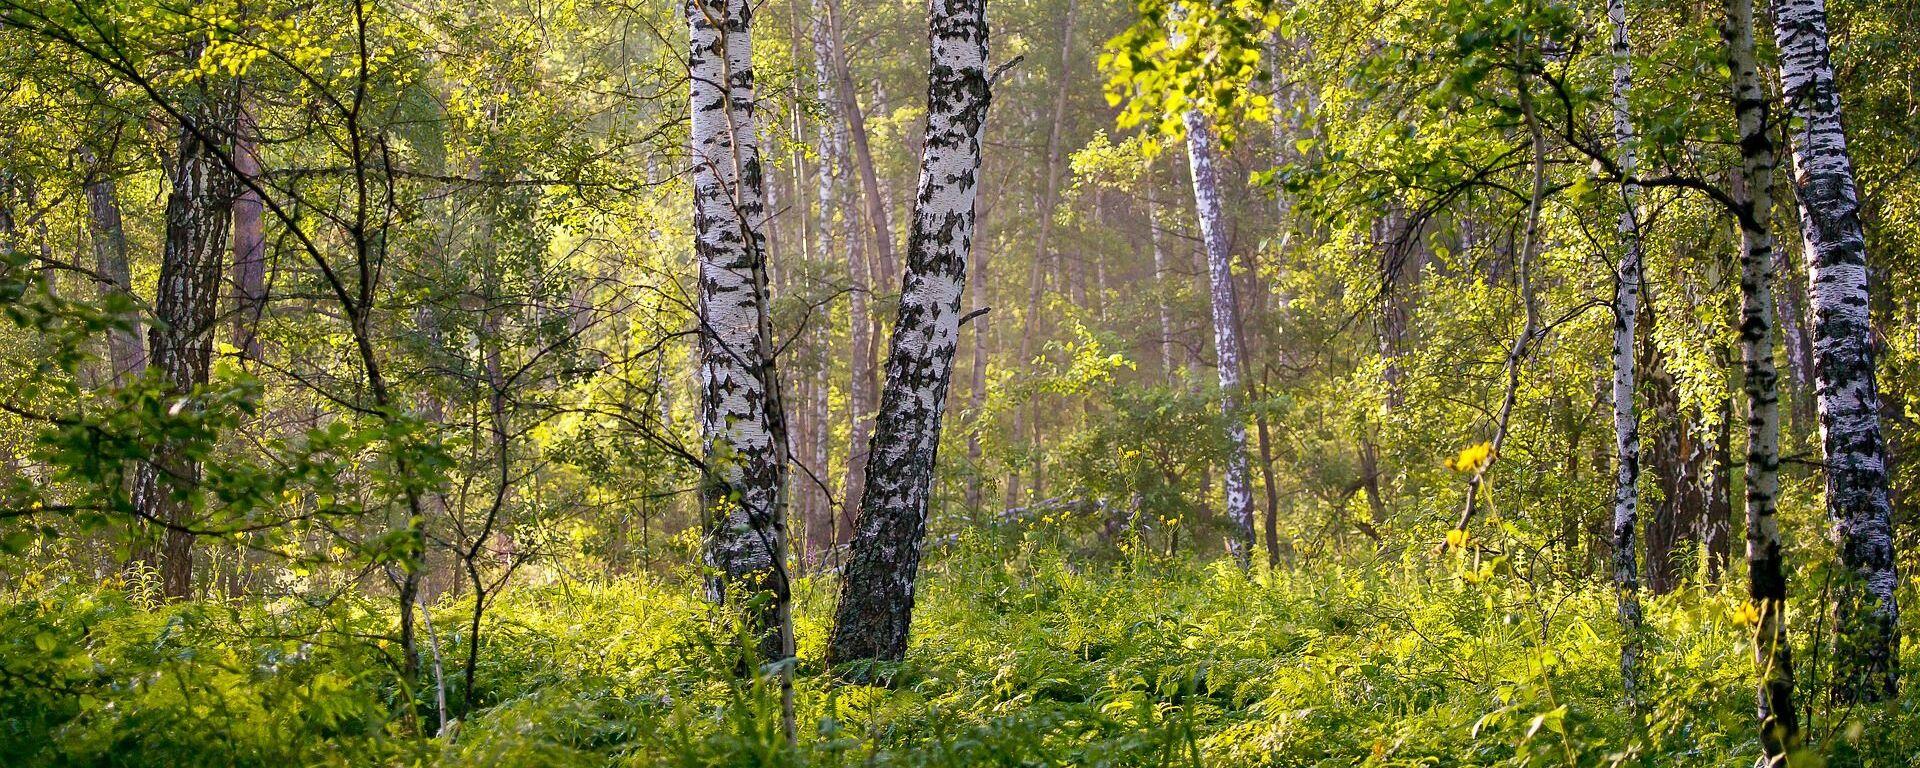 Летні лес, архіўнае фота - Sputnik Беларусь, 1920, 28.06.2021